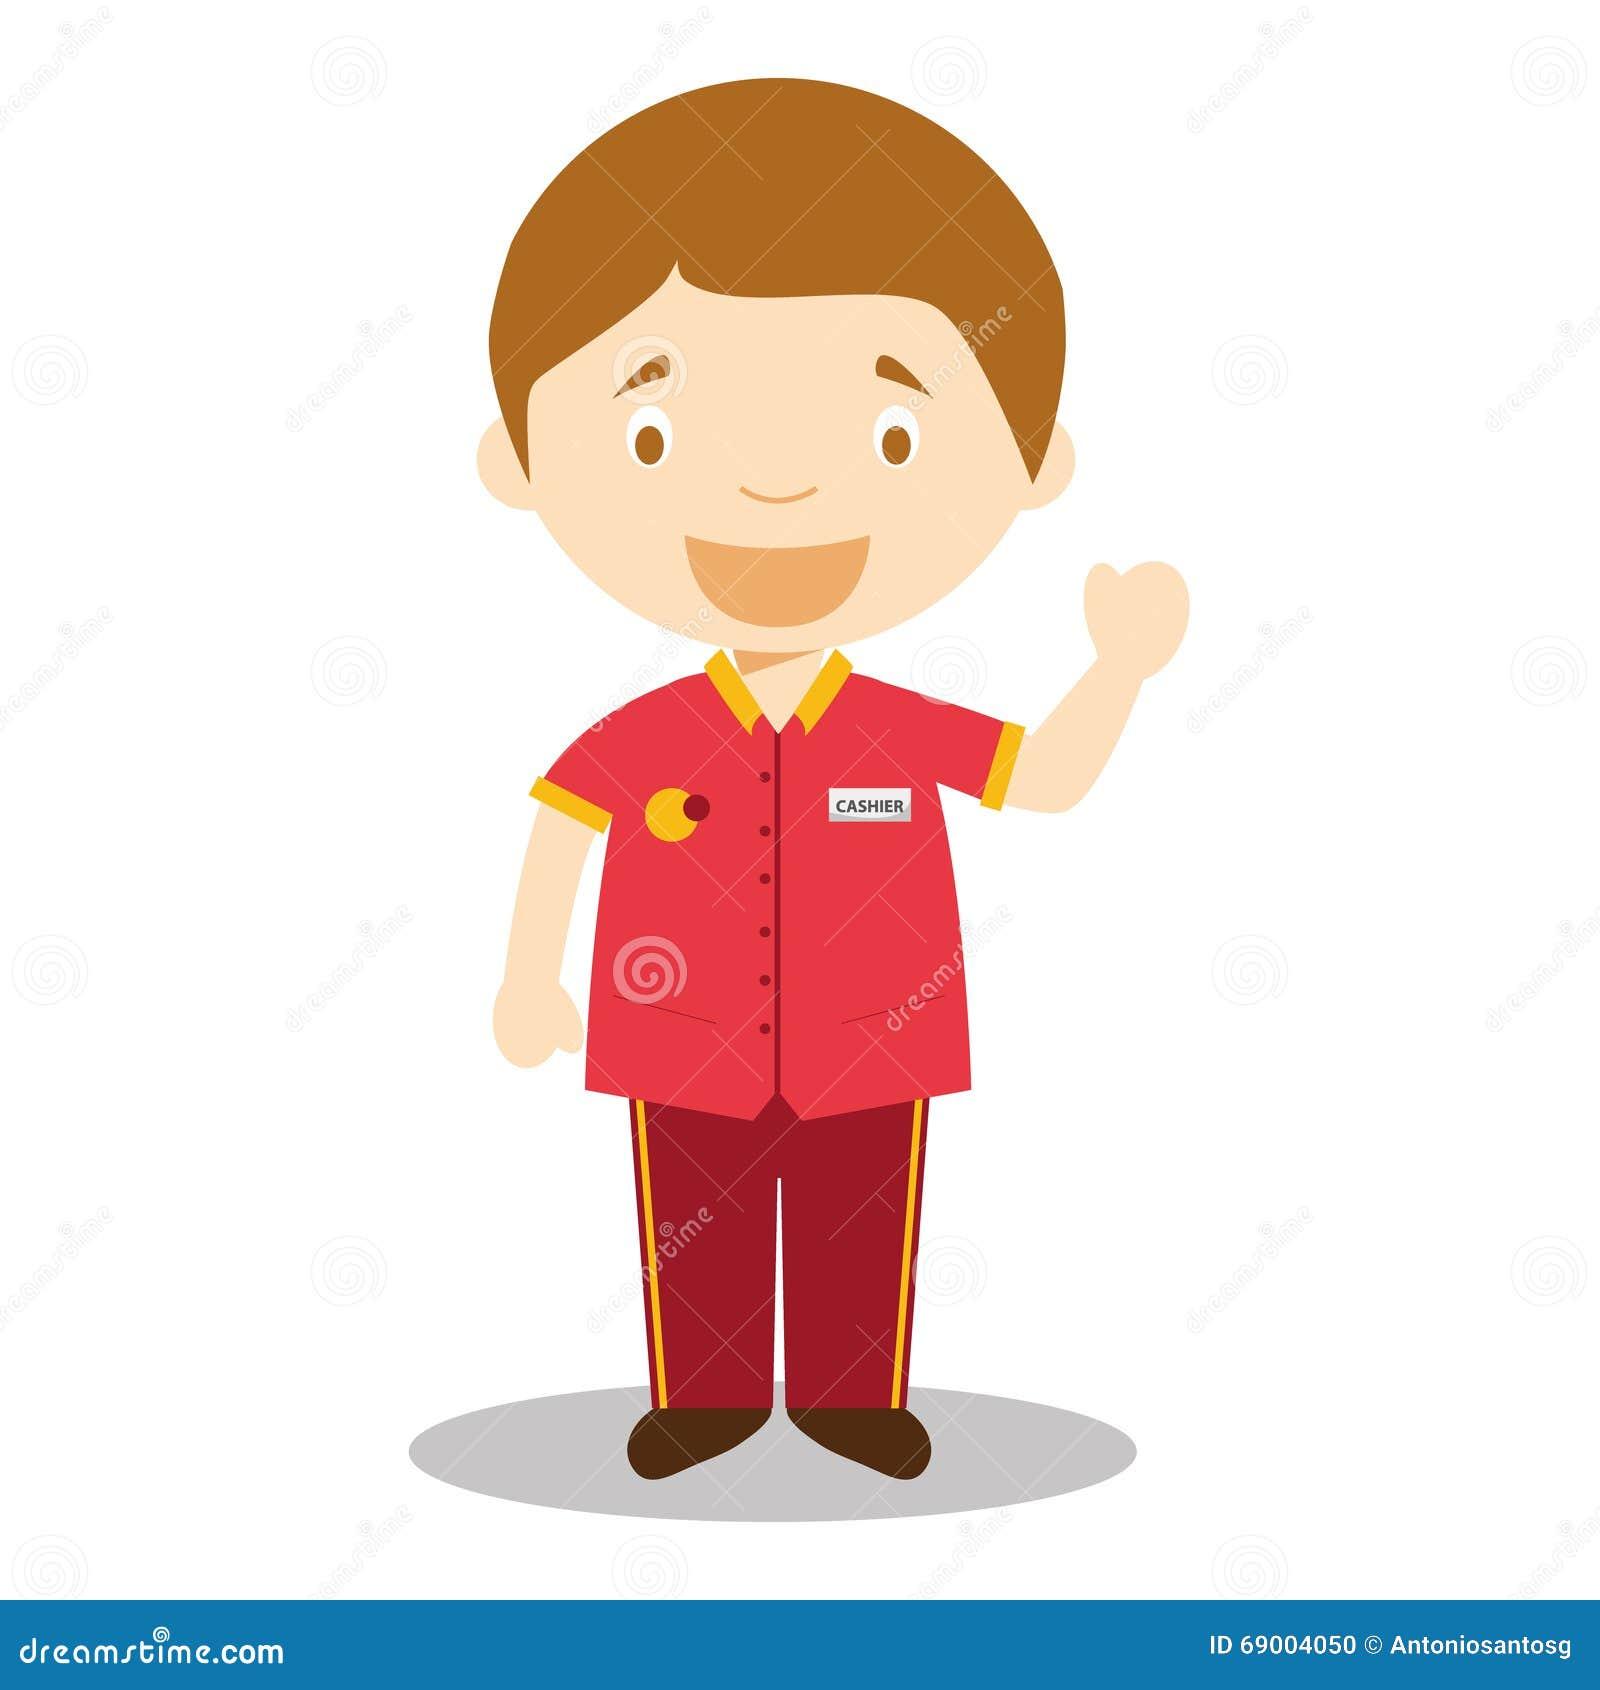 Cashier Cartoons: Cute Cartoon Vector Illustration Of A Clerk Or A Cashier